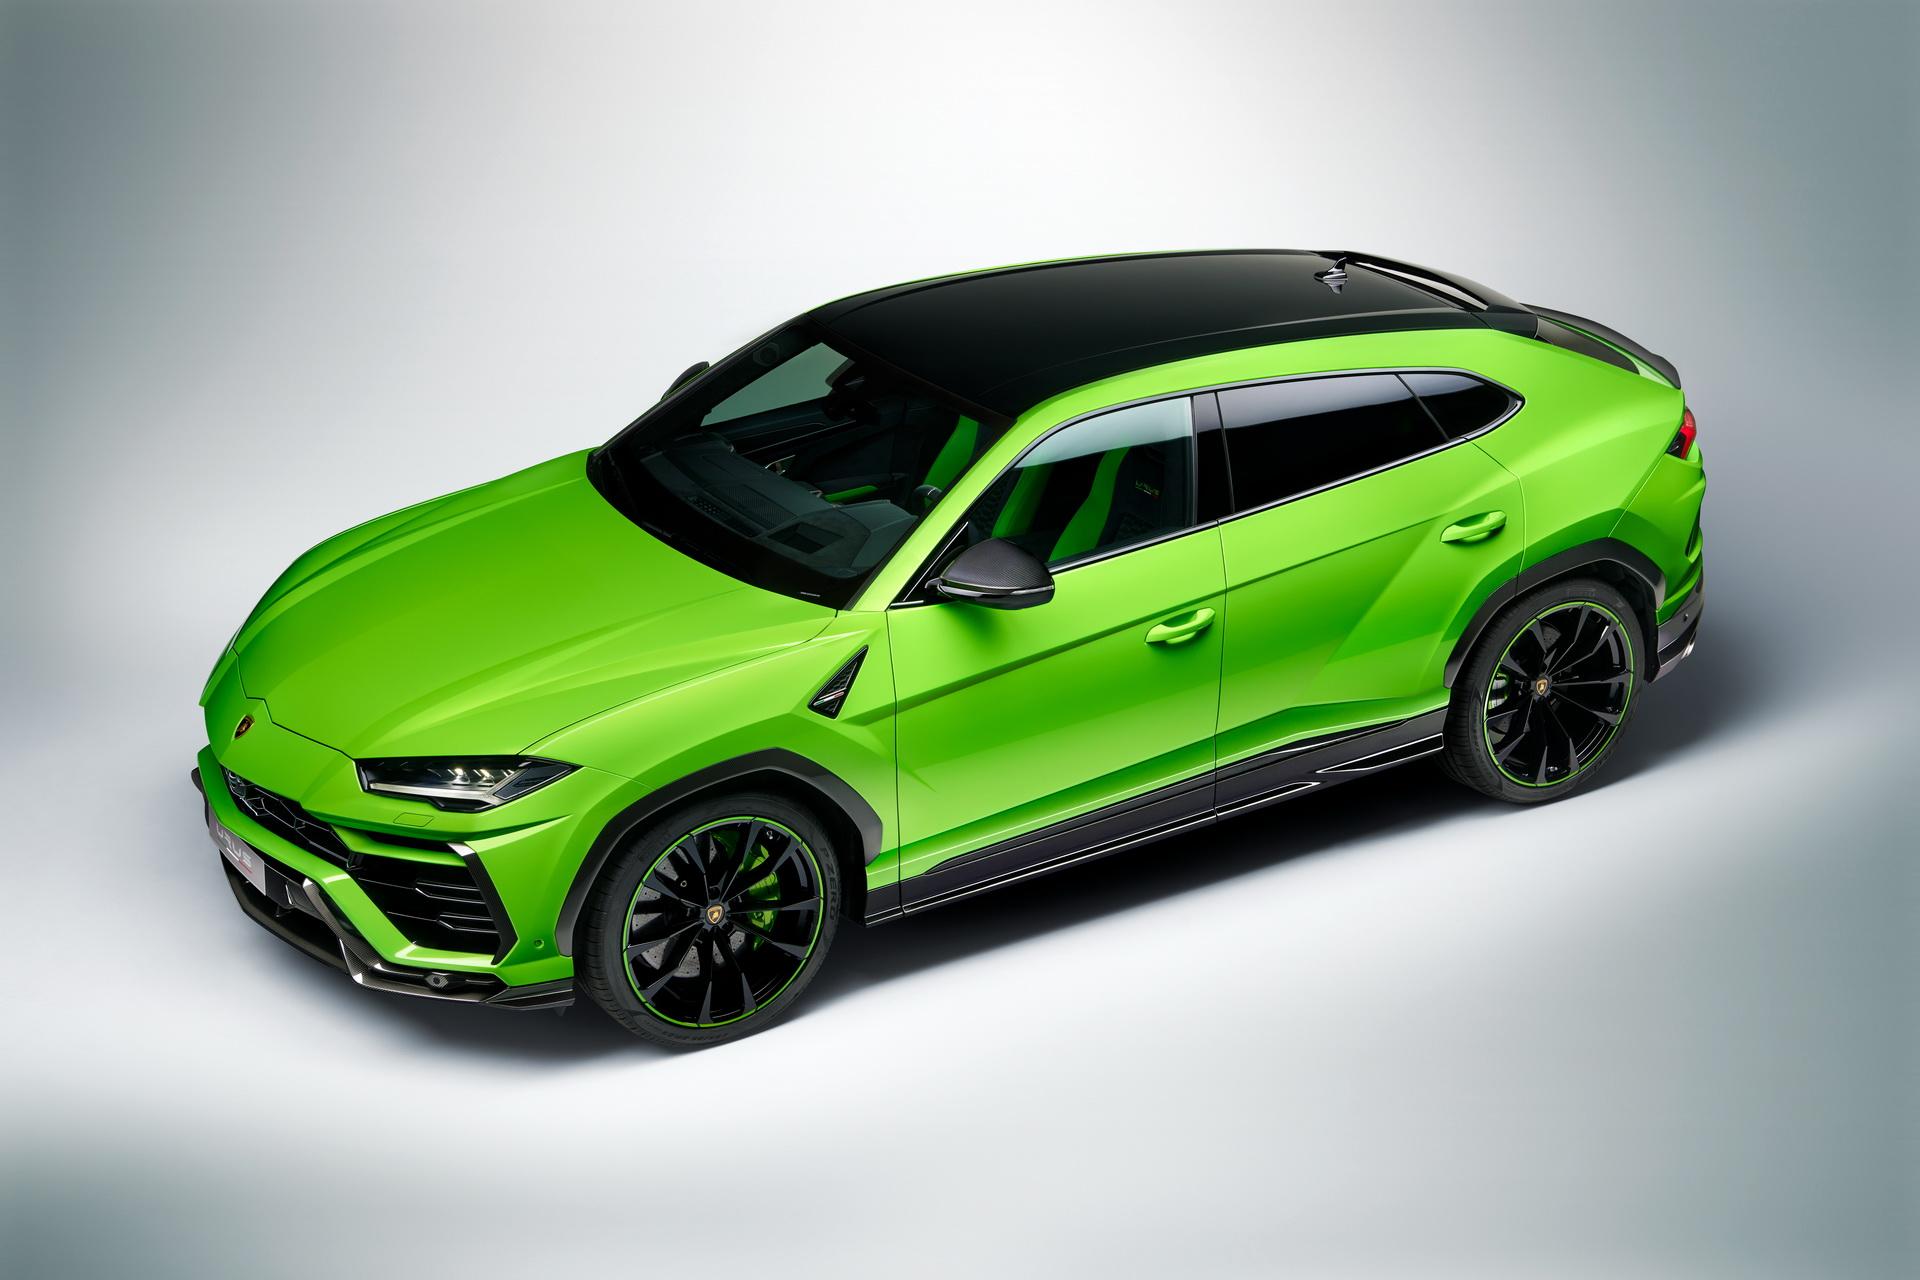 Lamborghini-Urus-Pearl-Capsule-Edition-1